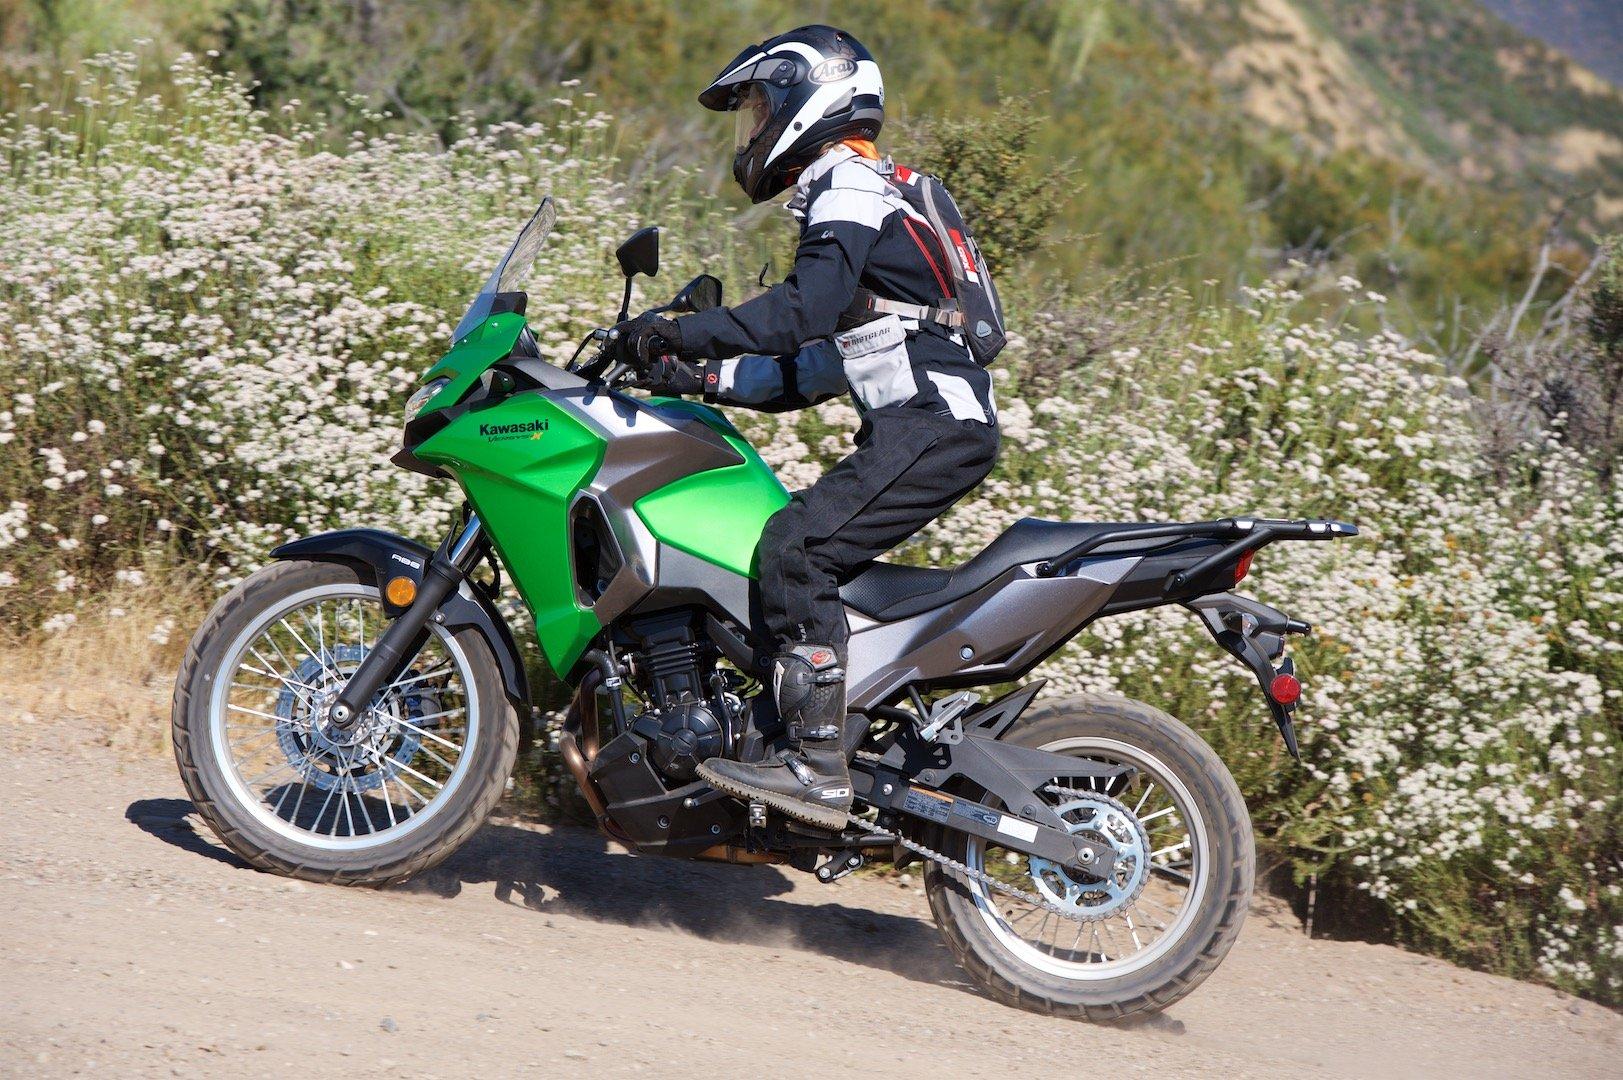 2017 Kawasaki Versys-X 300 Review | 13 Fast Facts